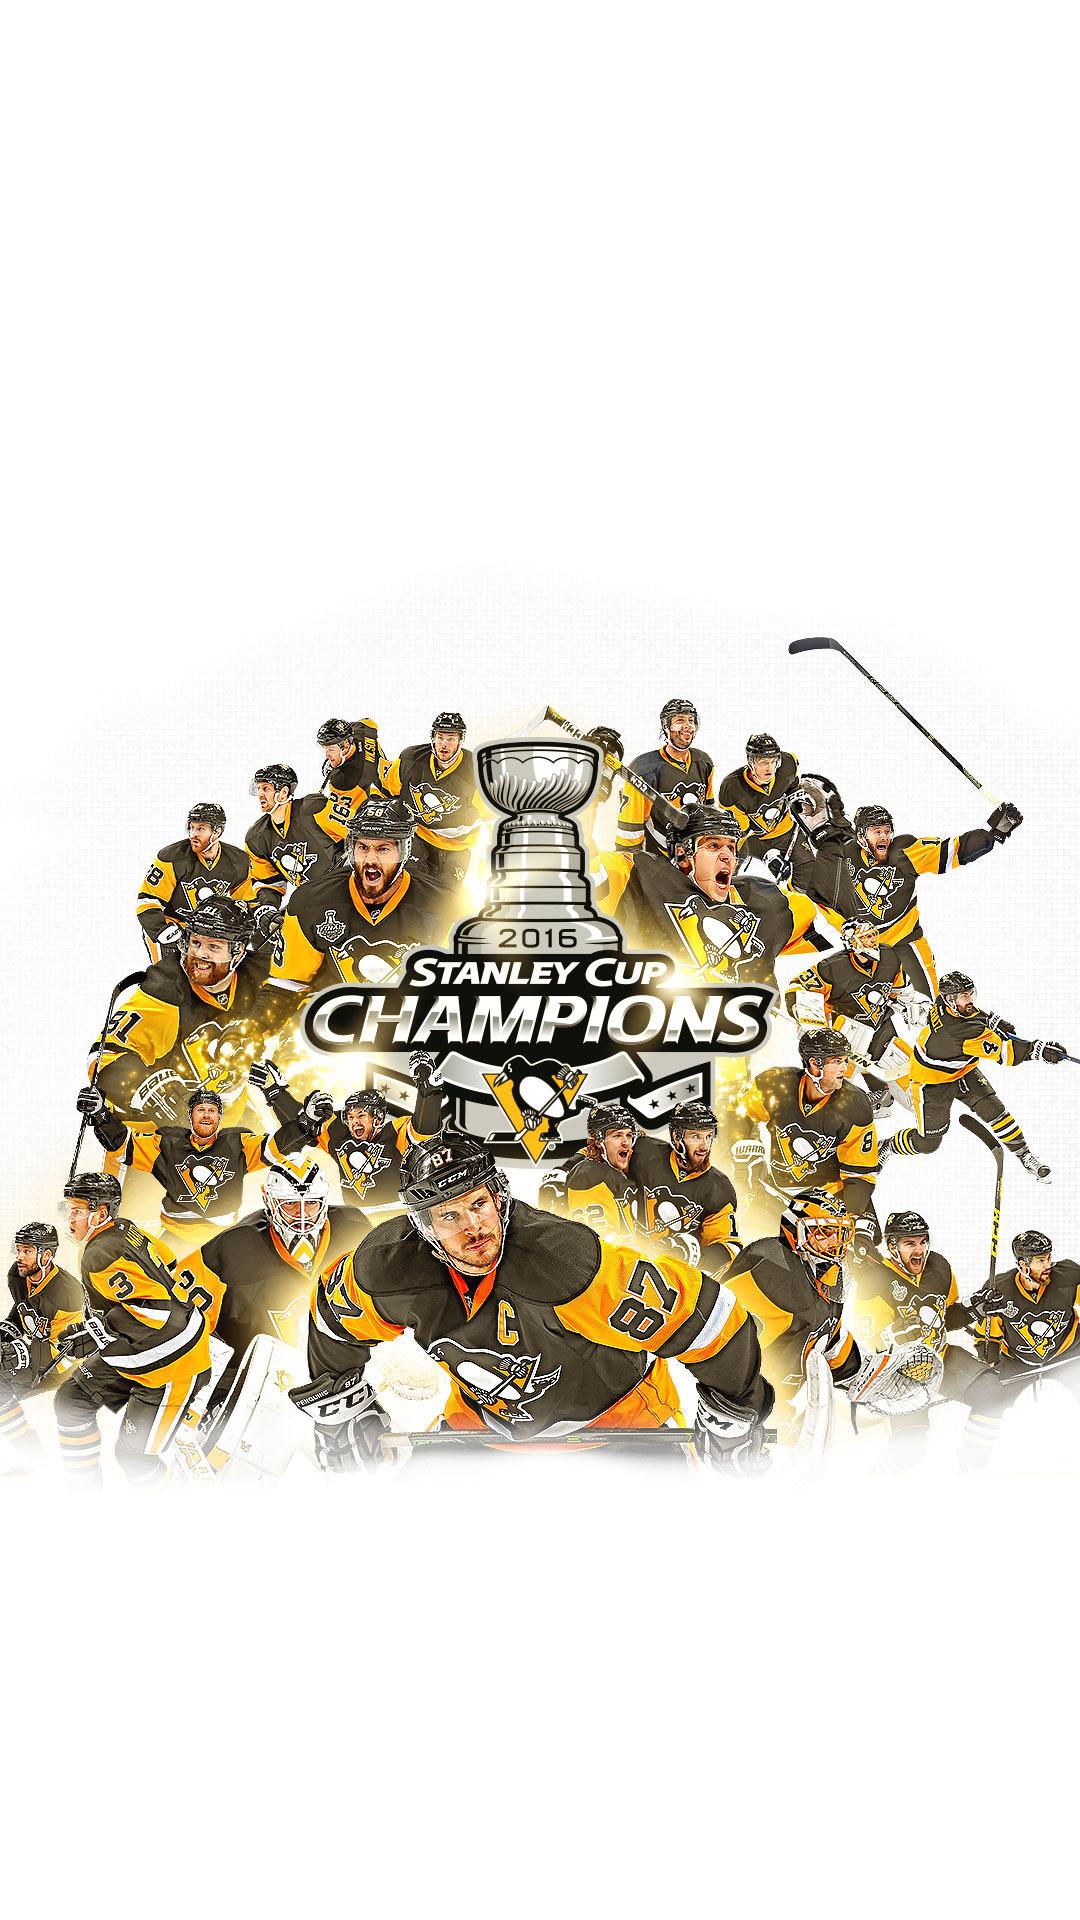 Pittsburgh Penguins Backgrounds Wallpaper | HD Wallpapers | Pinterest |  Wallpaper